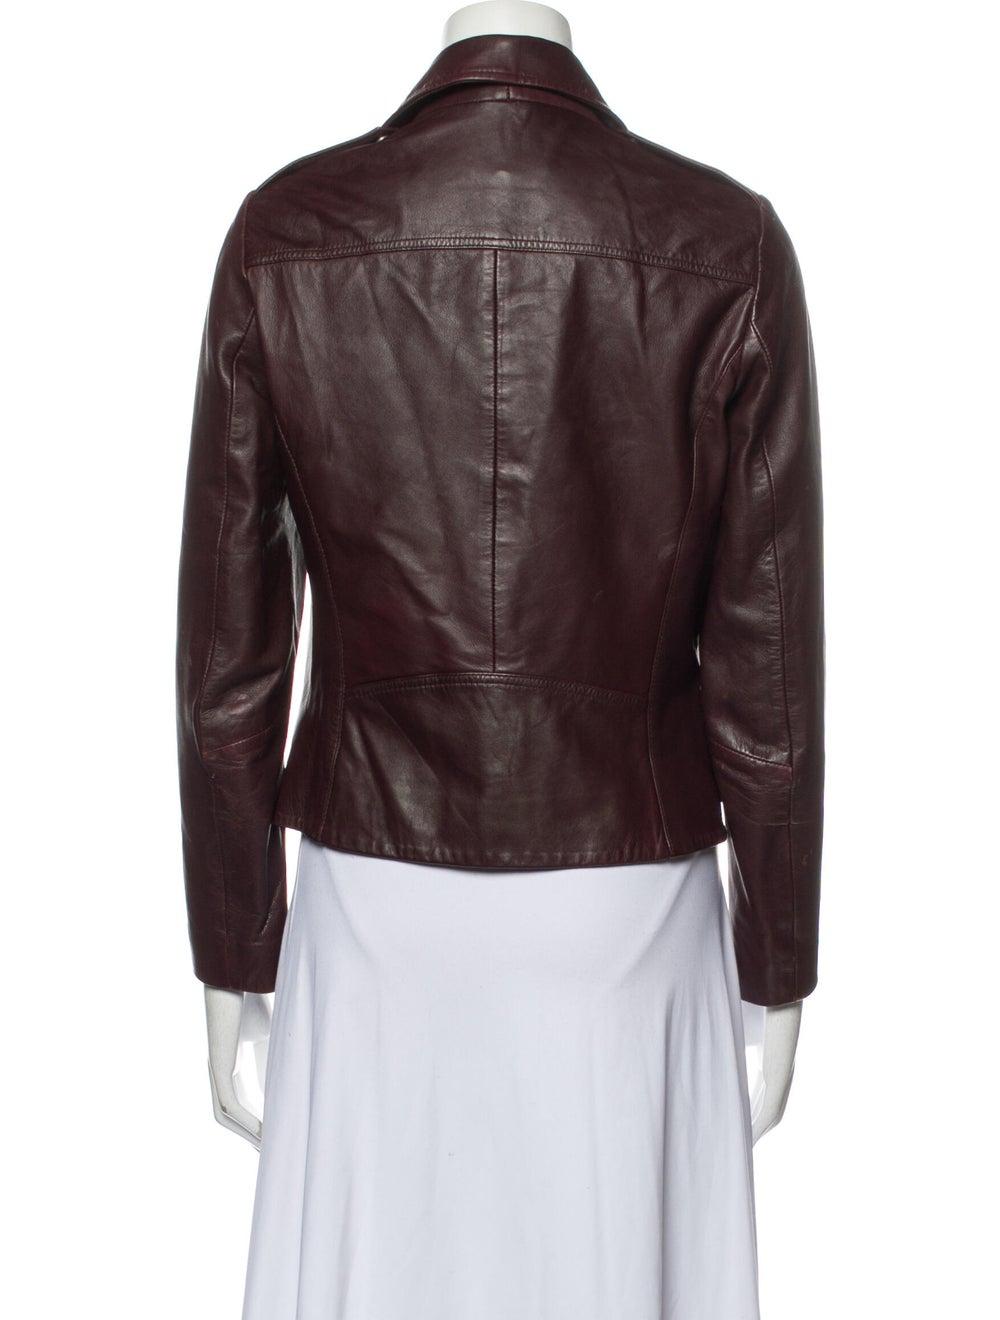 Sandro Lamb Leather Biker Jacket - image 3